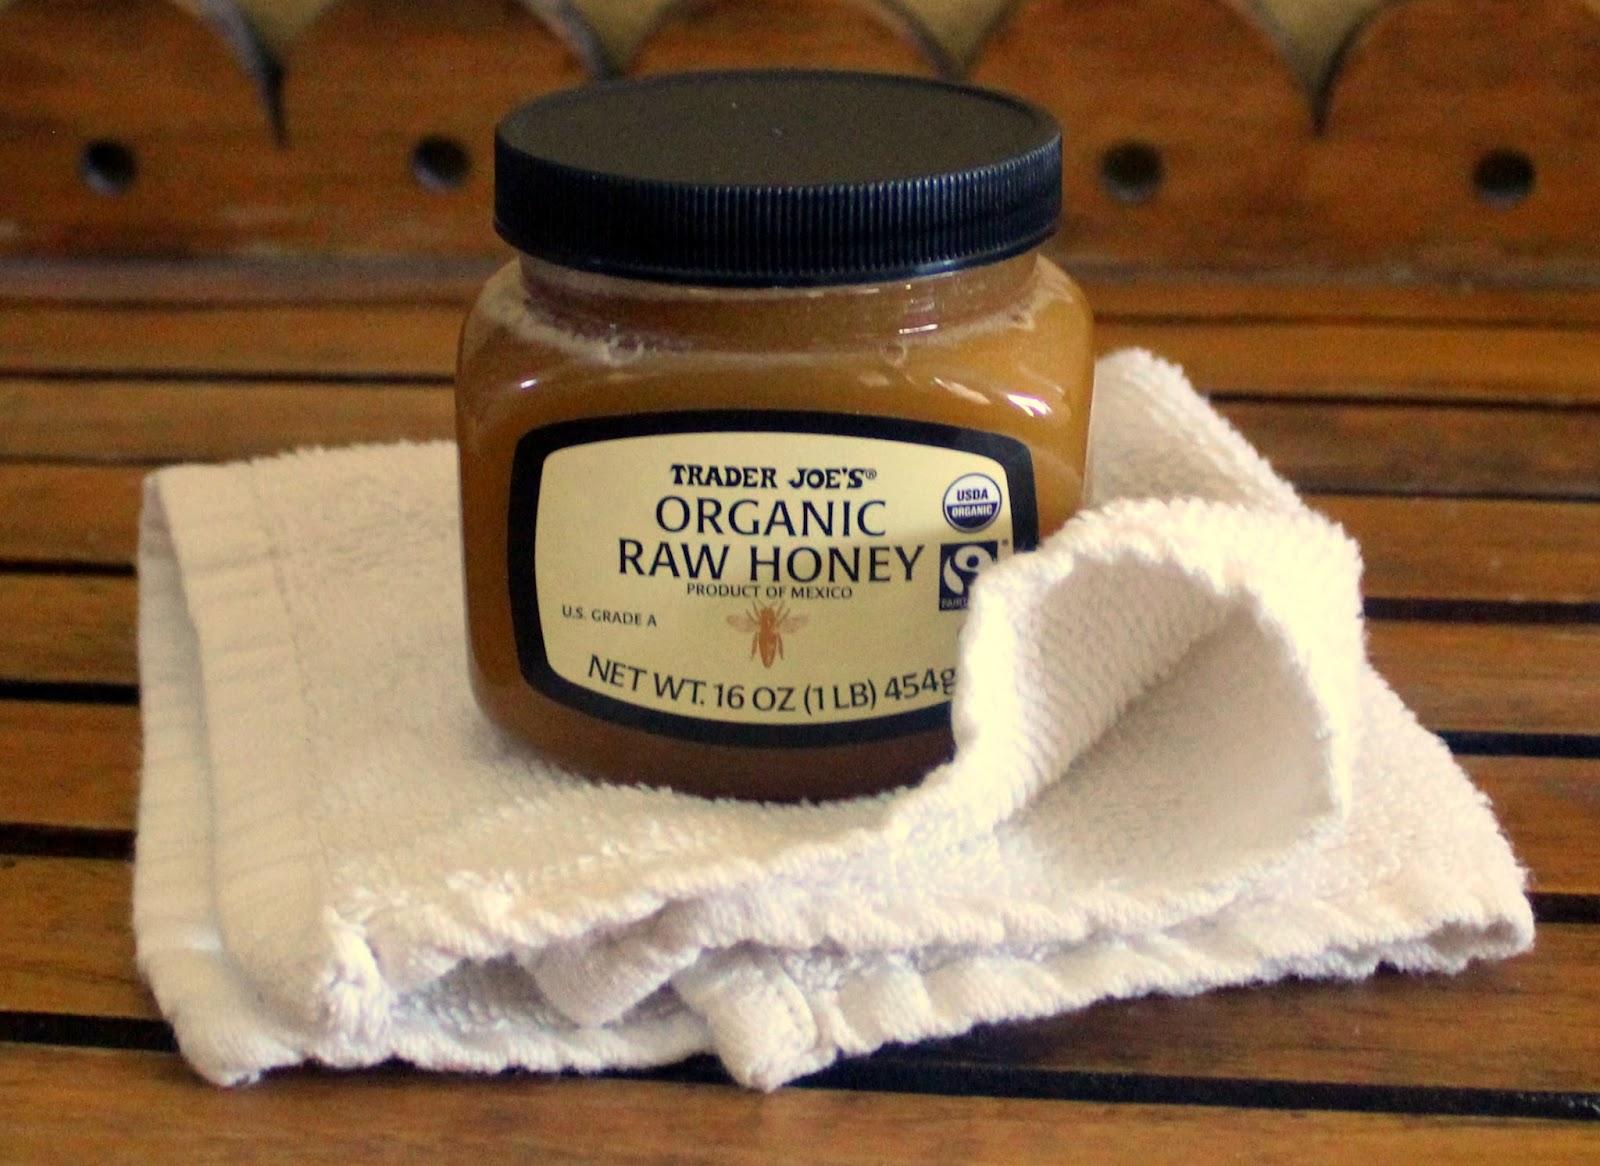 trader joe's raw organic honey